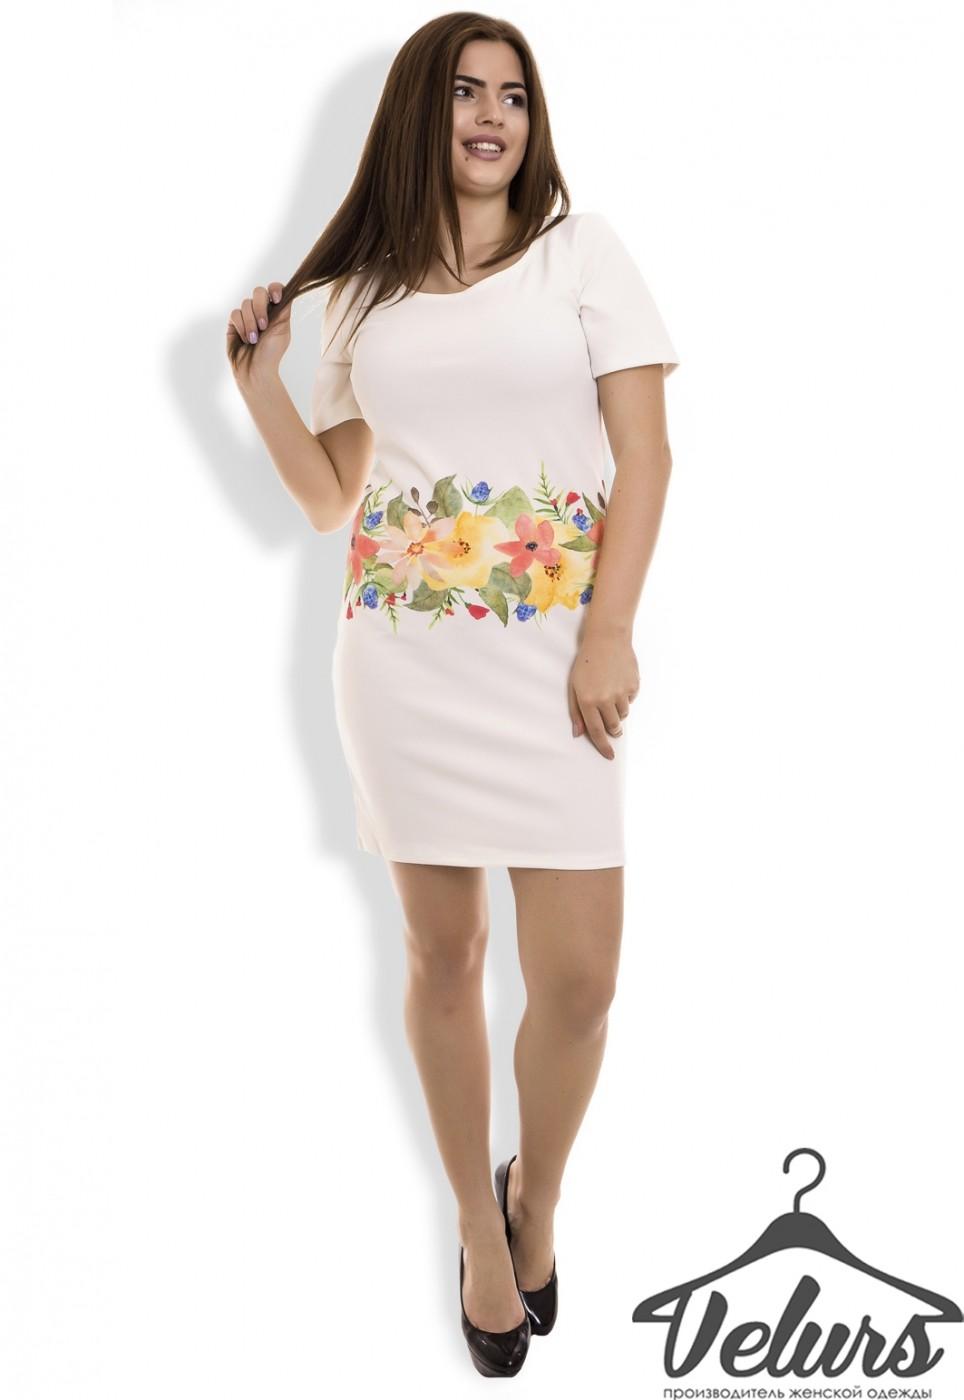 Velurs: Платье 212126 - фото 16